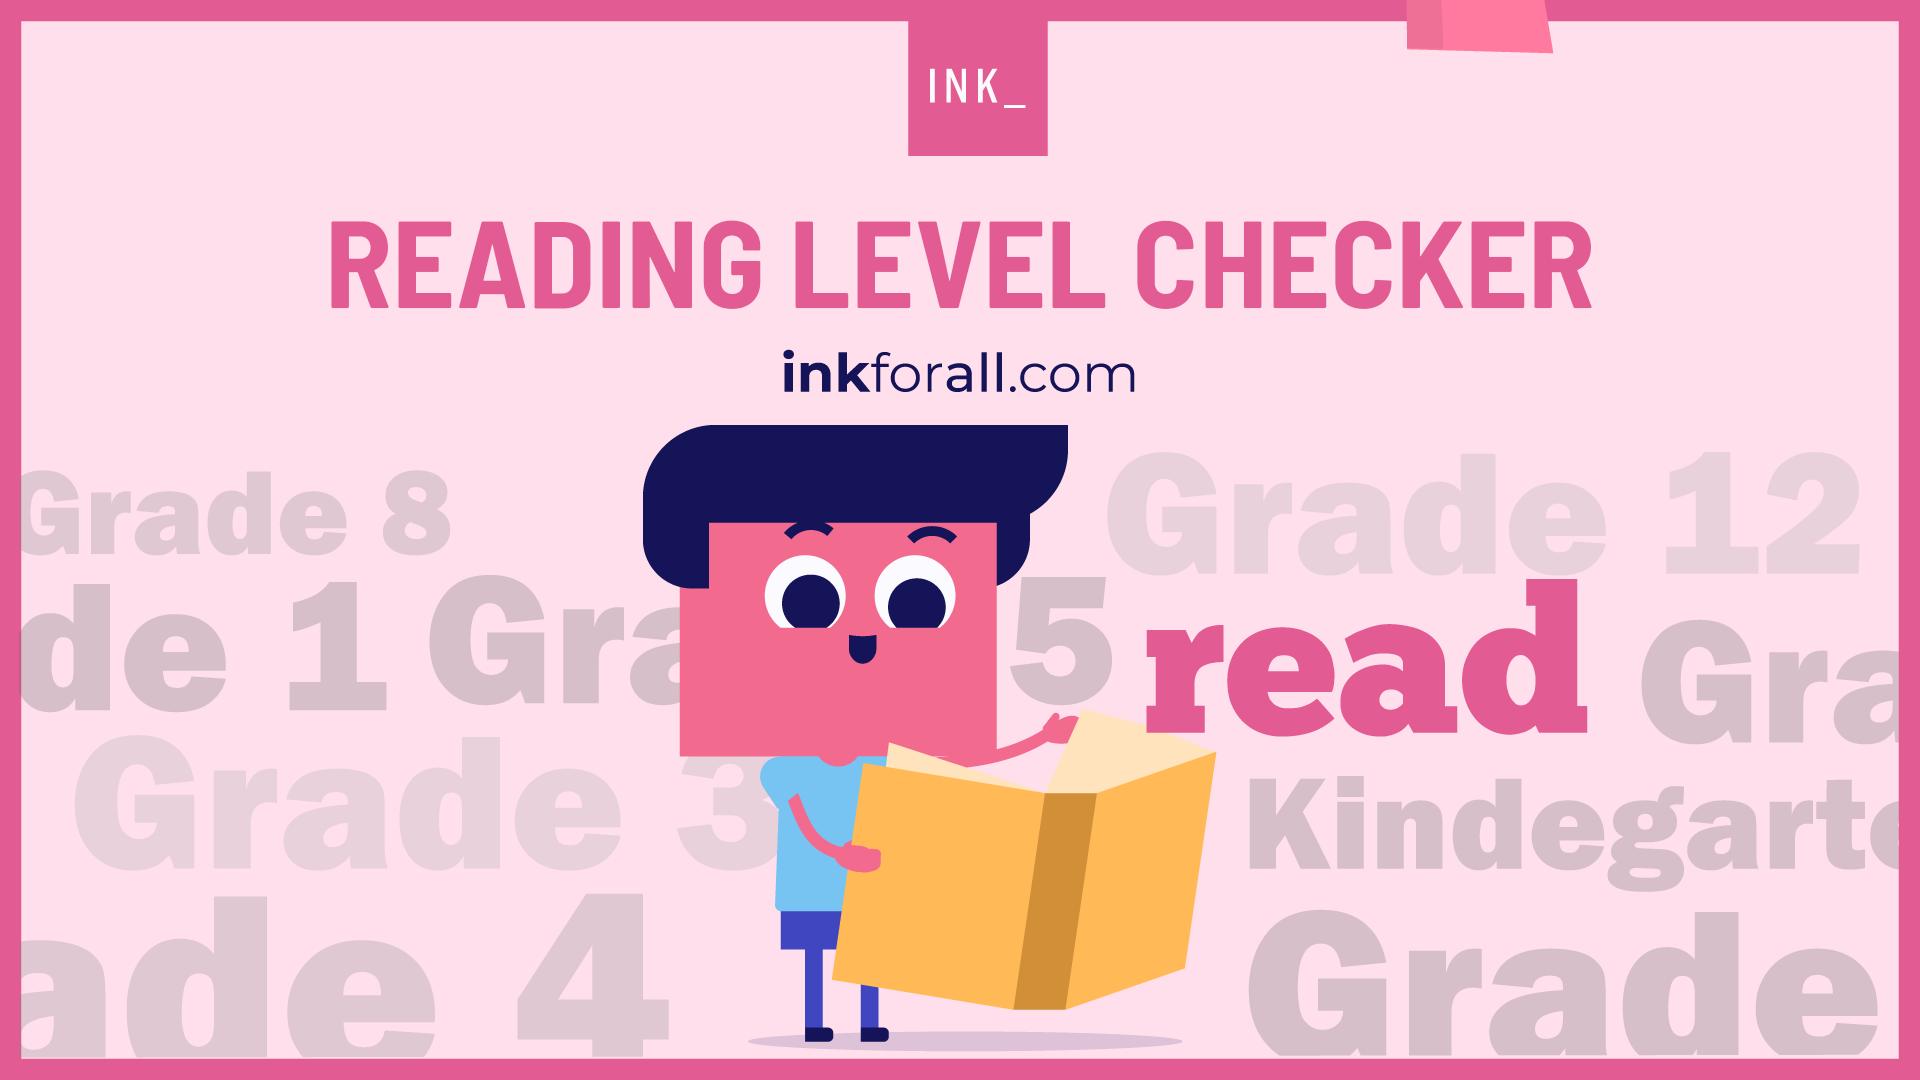 INK reading level checker